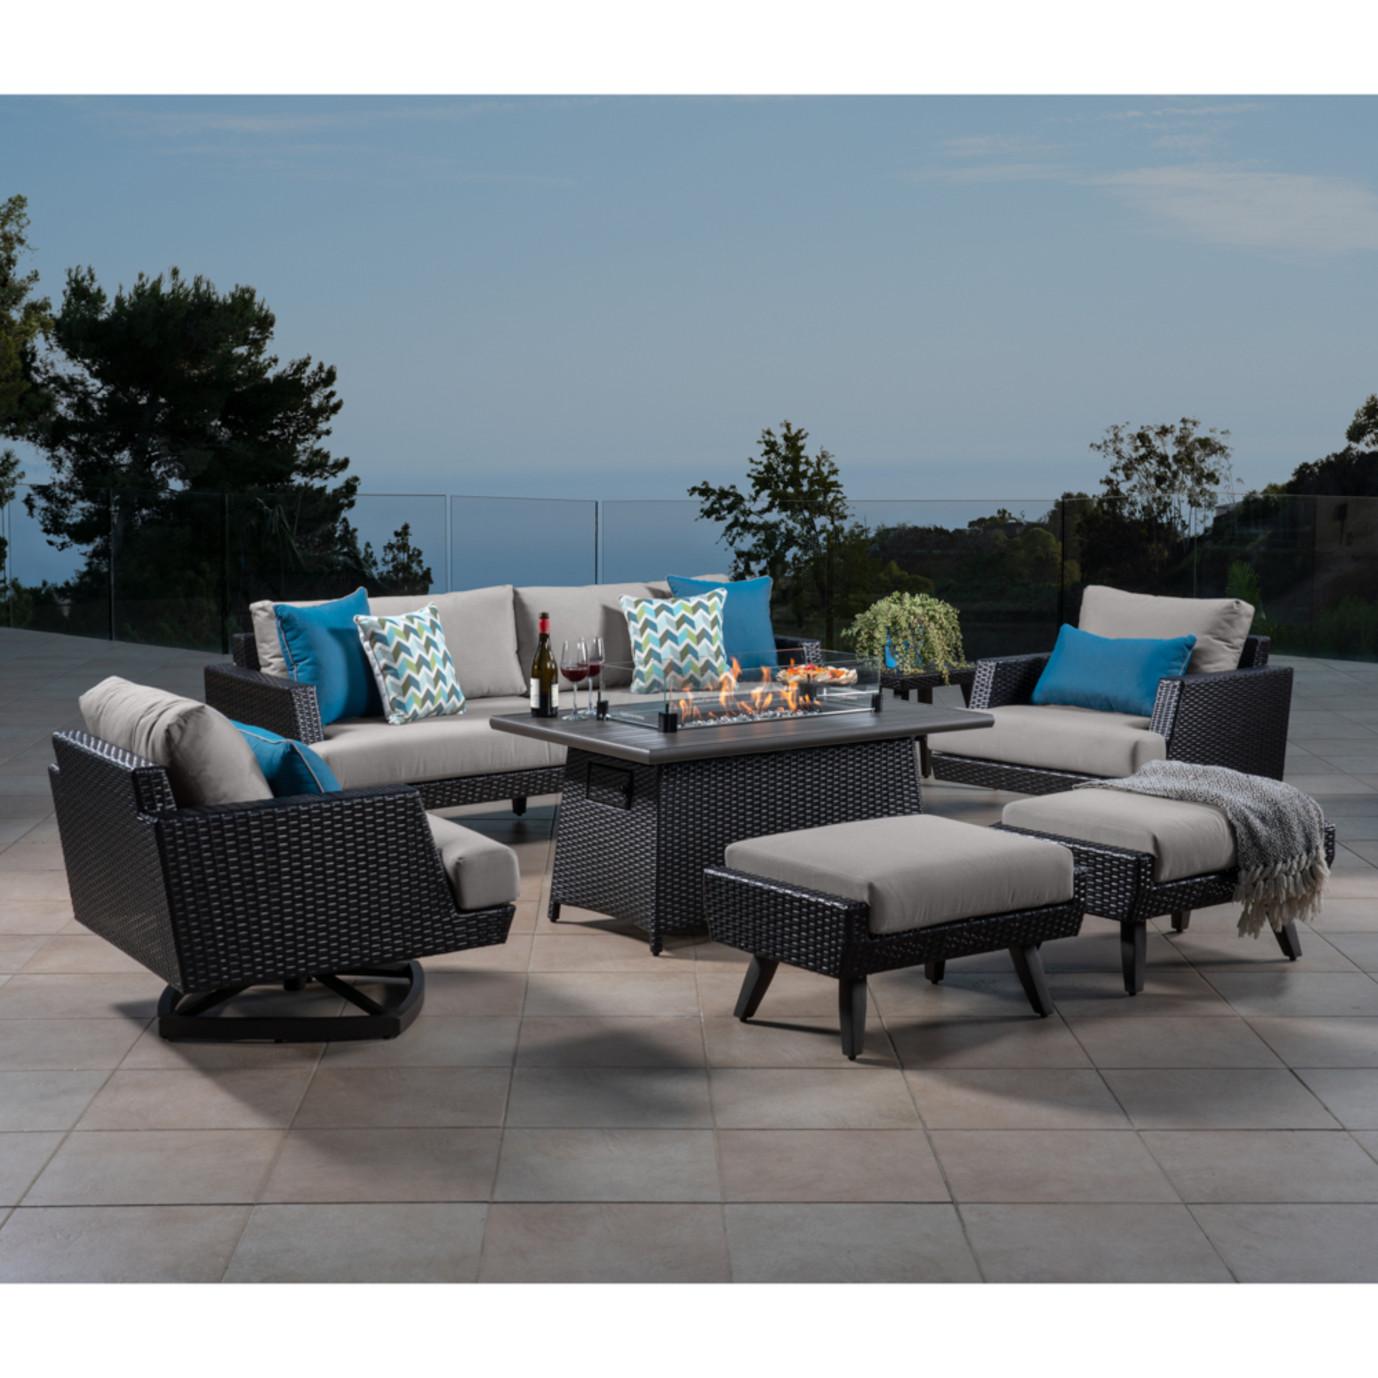 Portofino® Casual 7 Piece Motion Fire Seating Set - Dove Gray